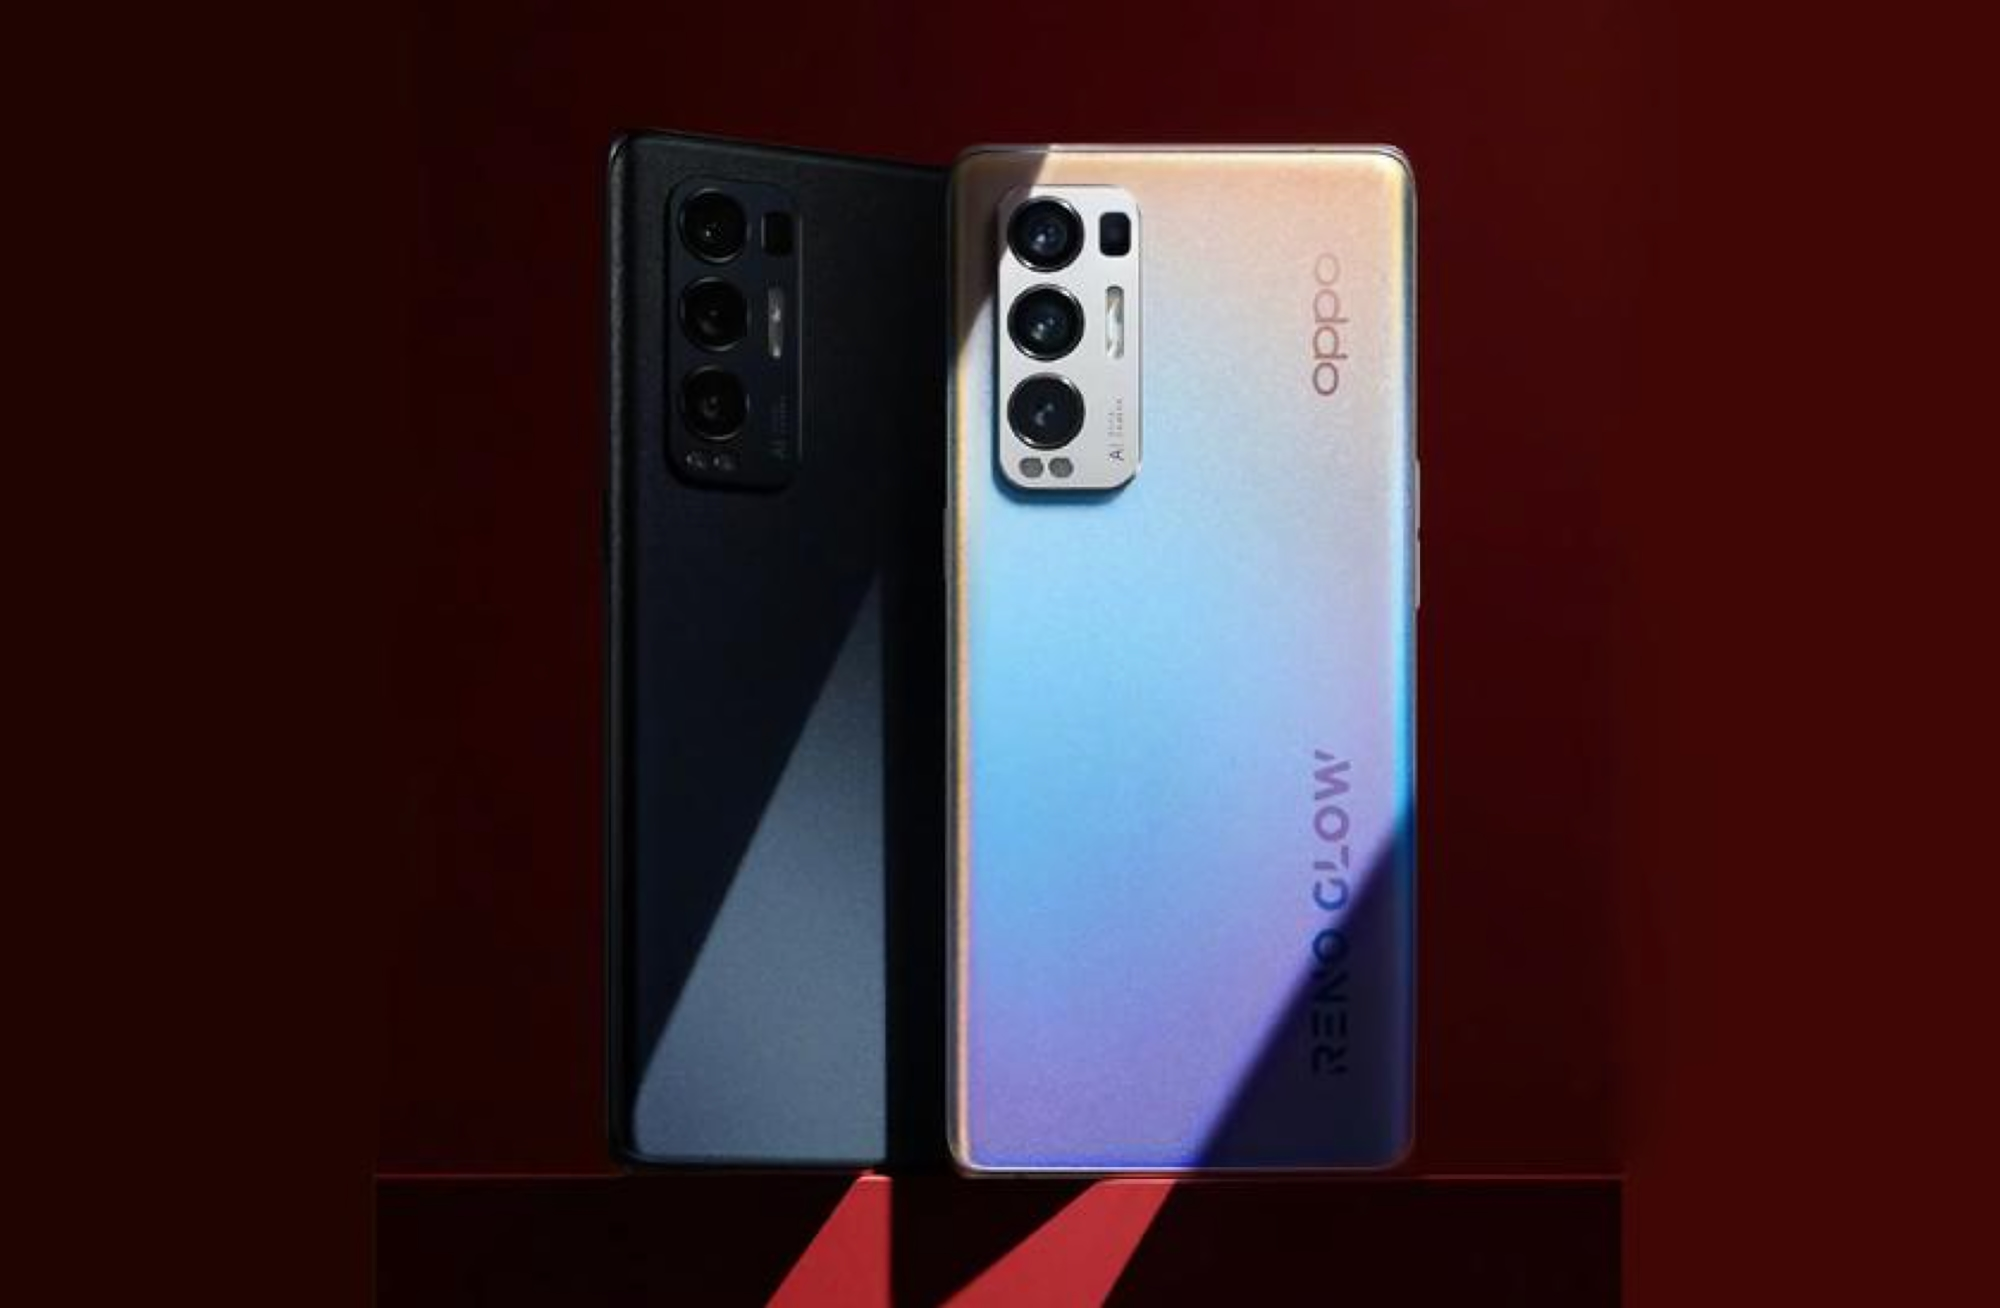 OPPO тизерит Reno 5 Pro+: чип Snapdragon 865, 65-ваттная зарядка и основной датчик камеры Sony IMX766 на 50 Мп